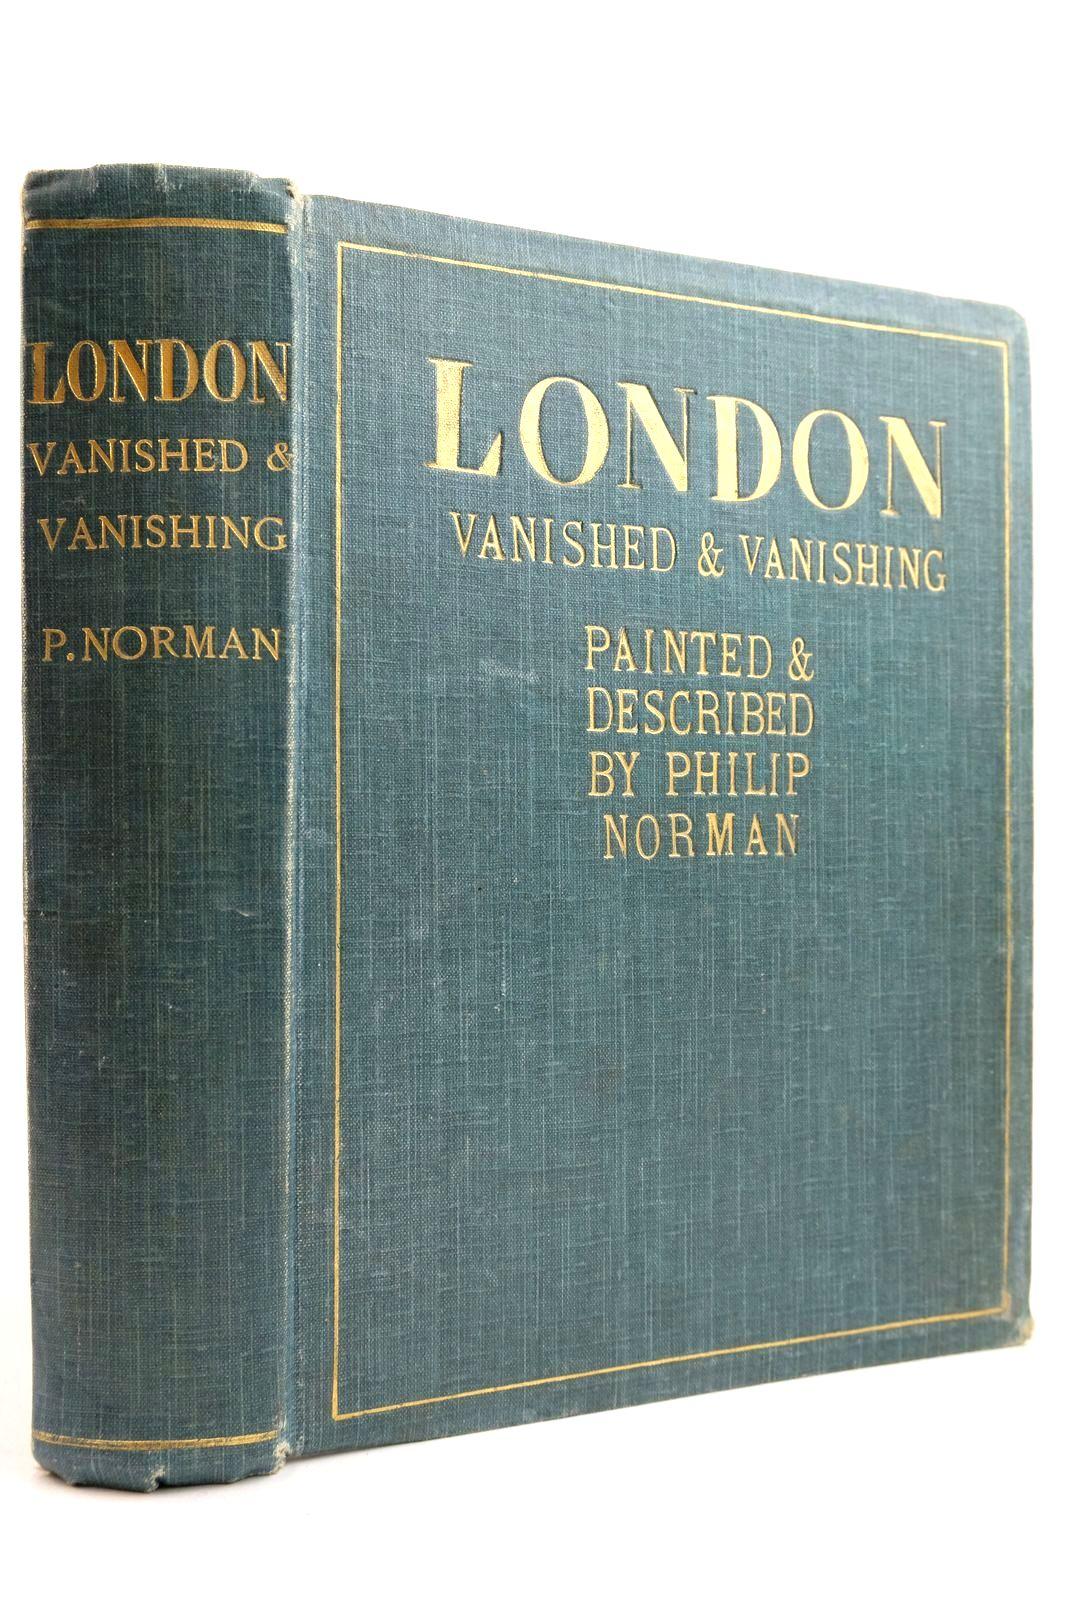 Photo of LONDON VANISHED & VANISHING- Stock Number: 2134074